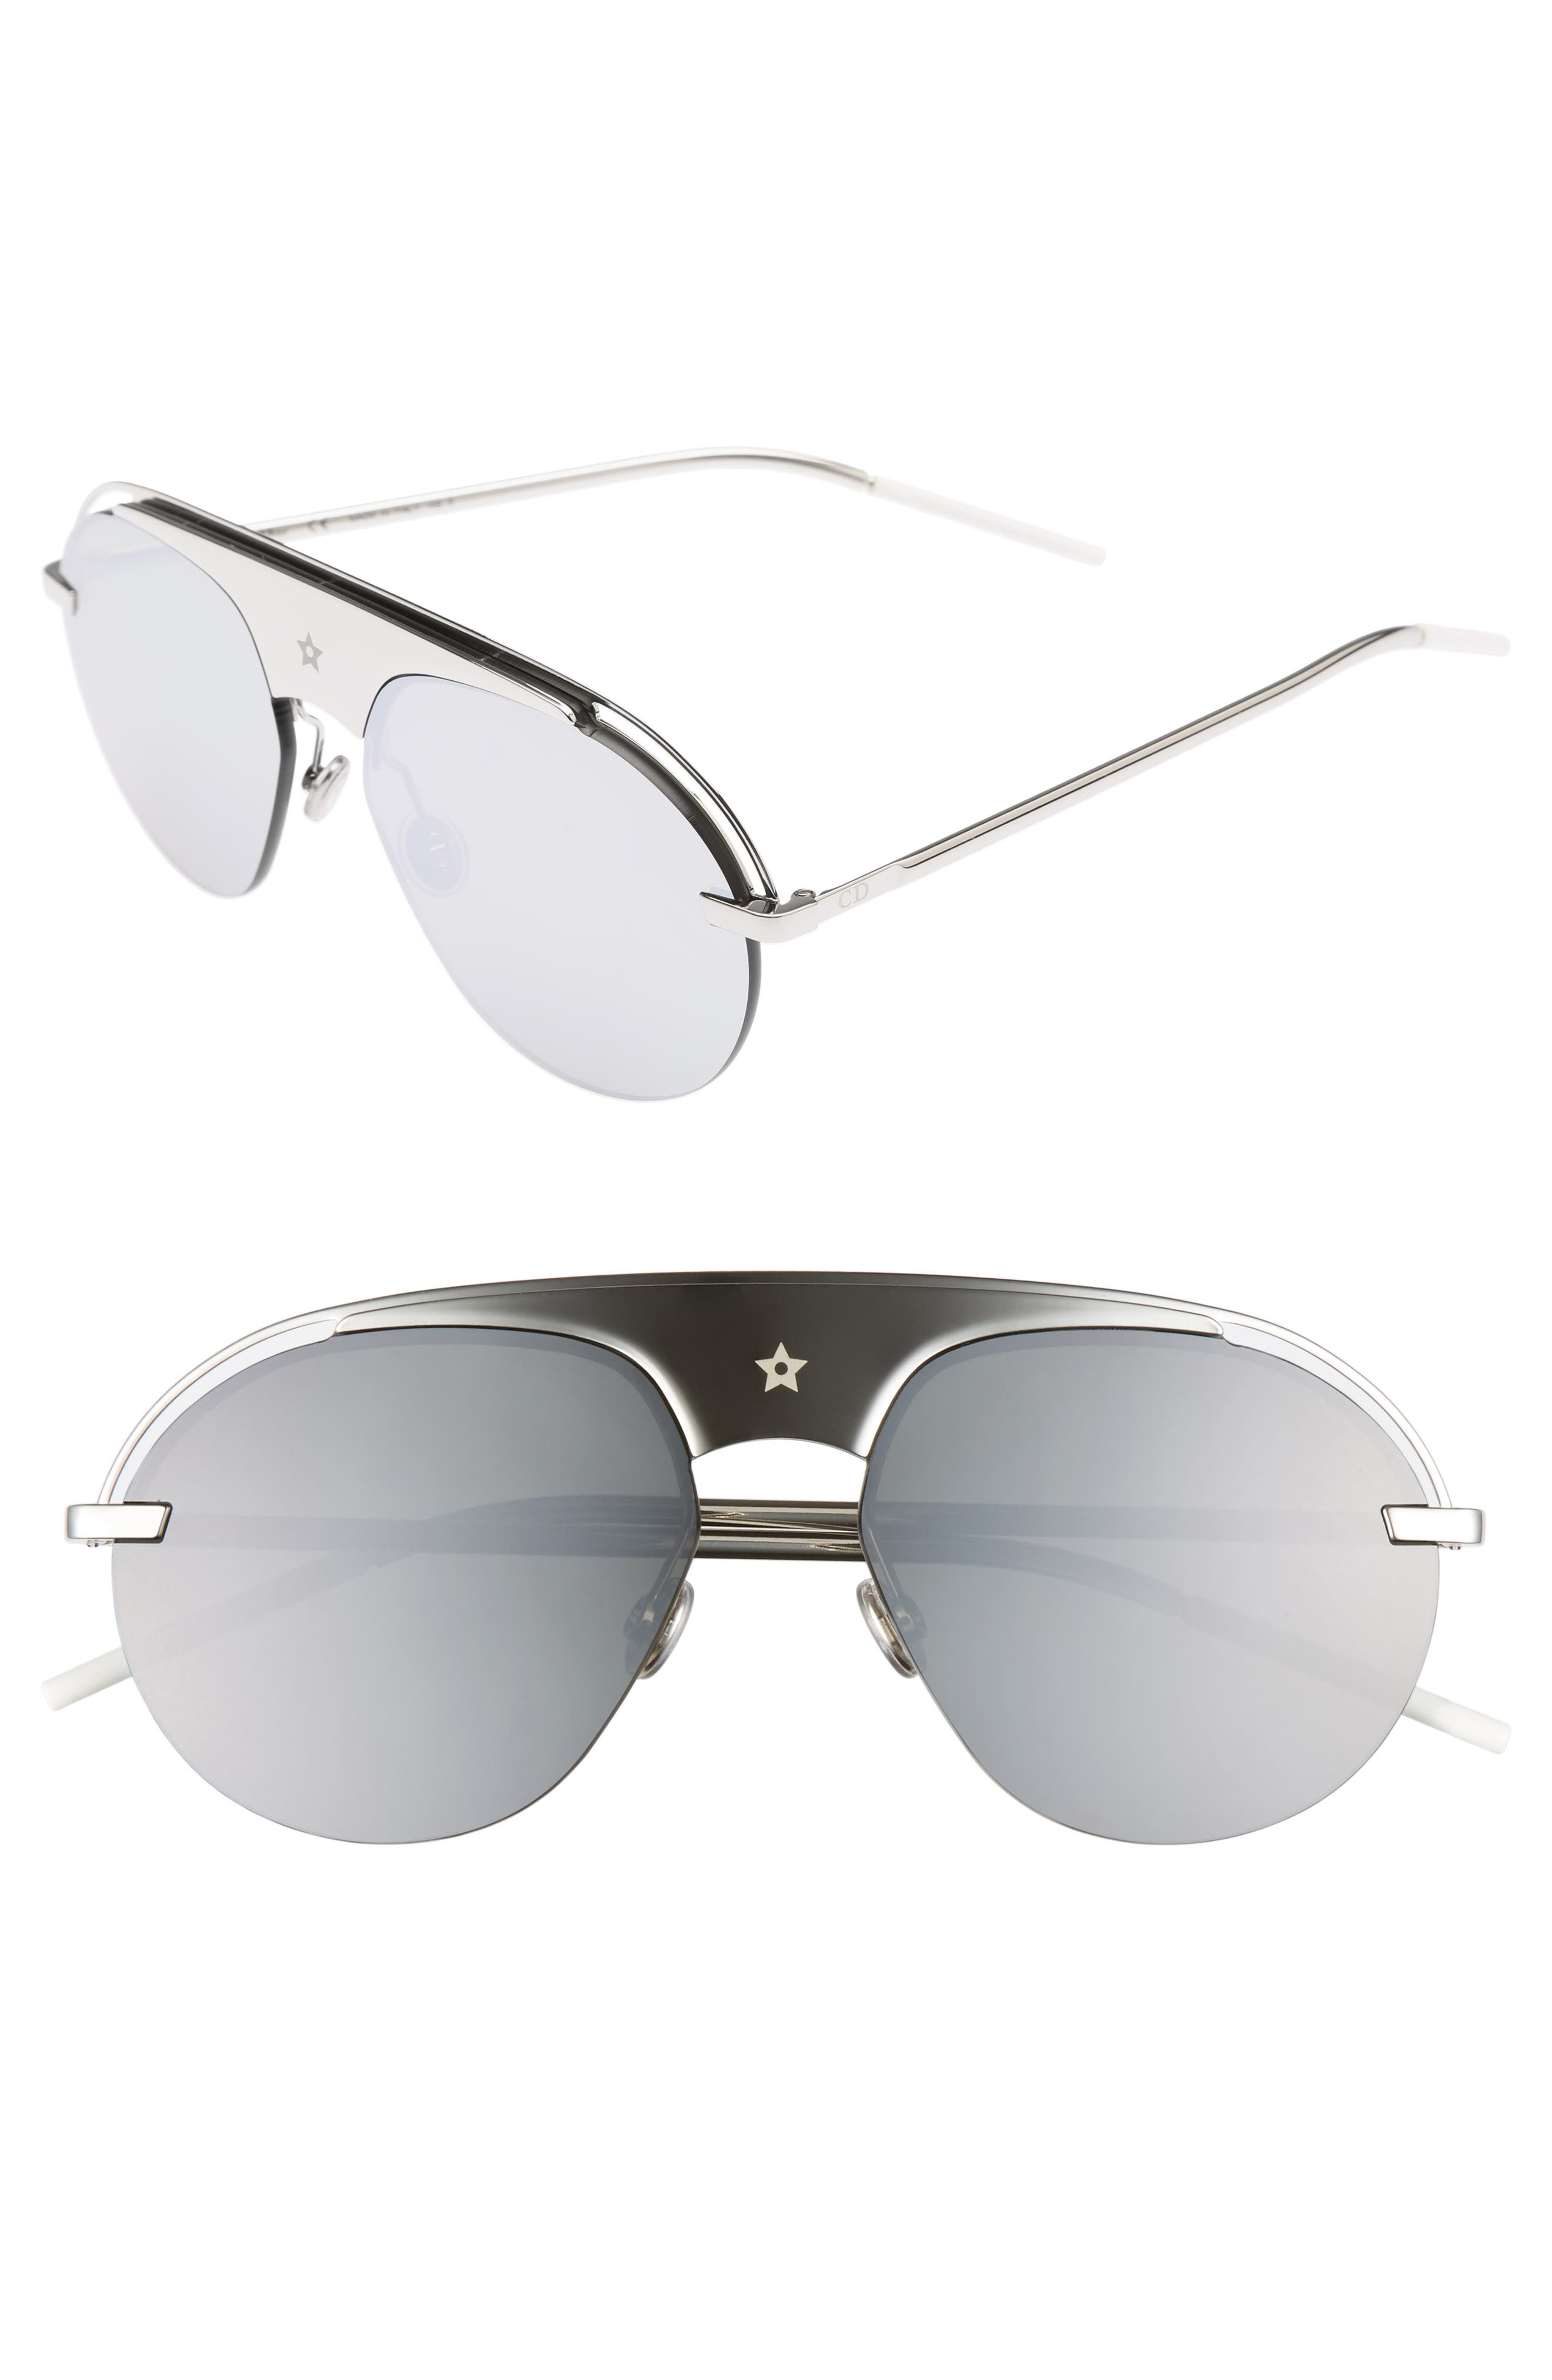 Main Image - Dior Evolution 2 60mm Aviator Sunglasses